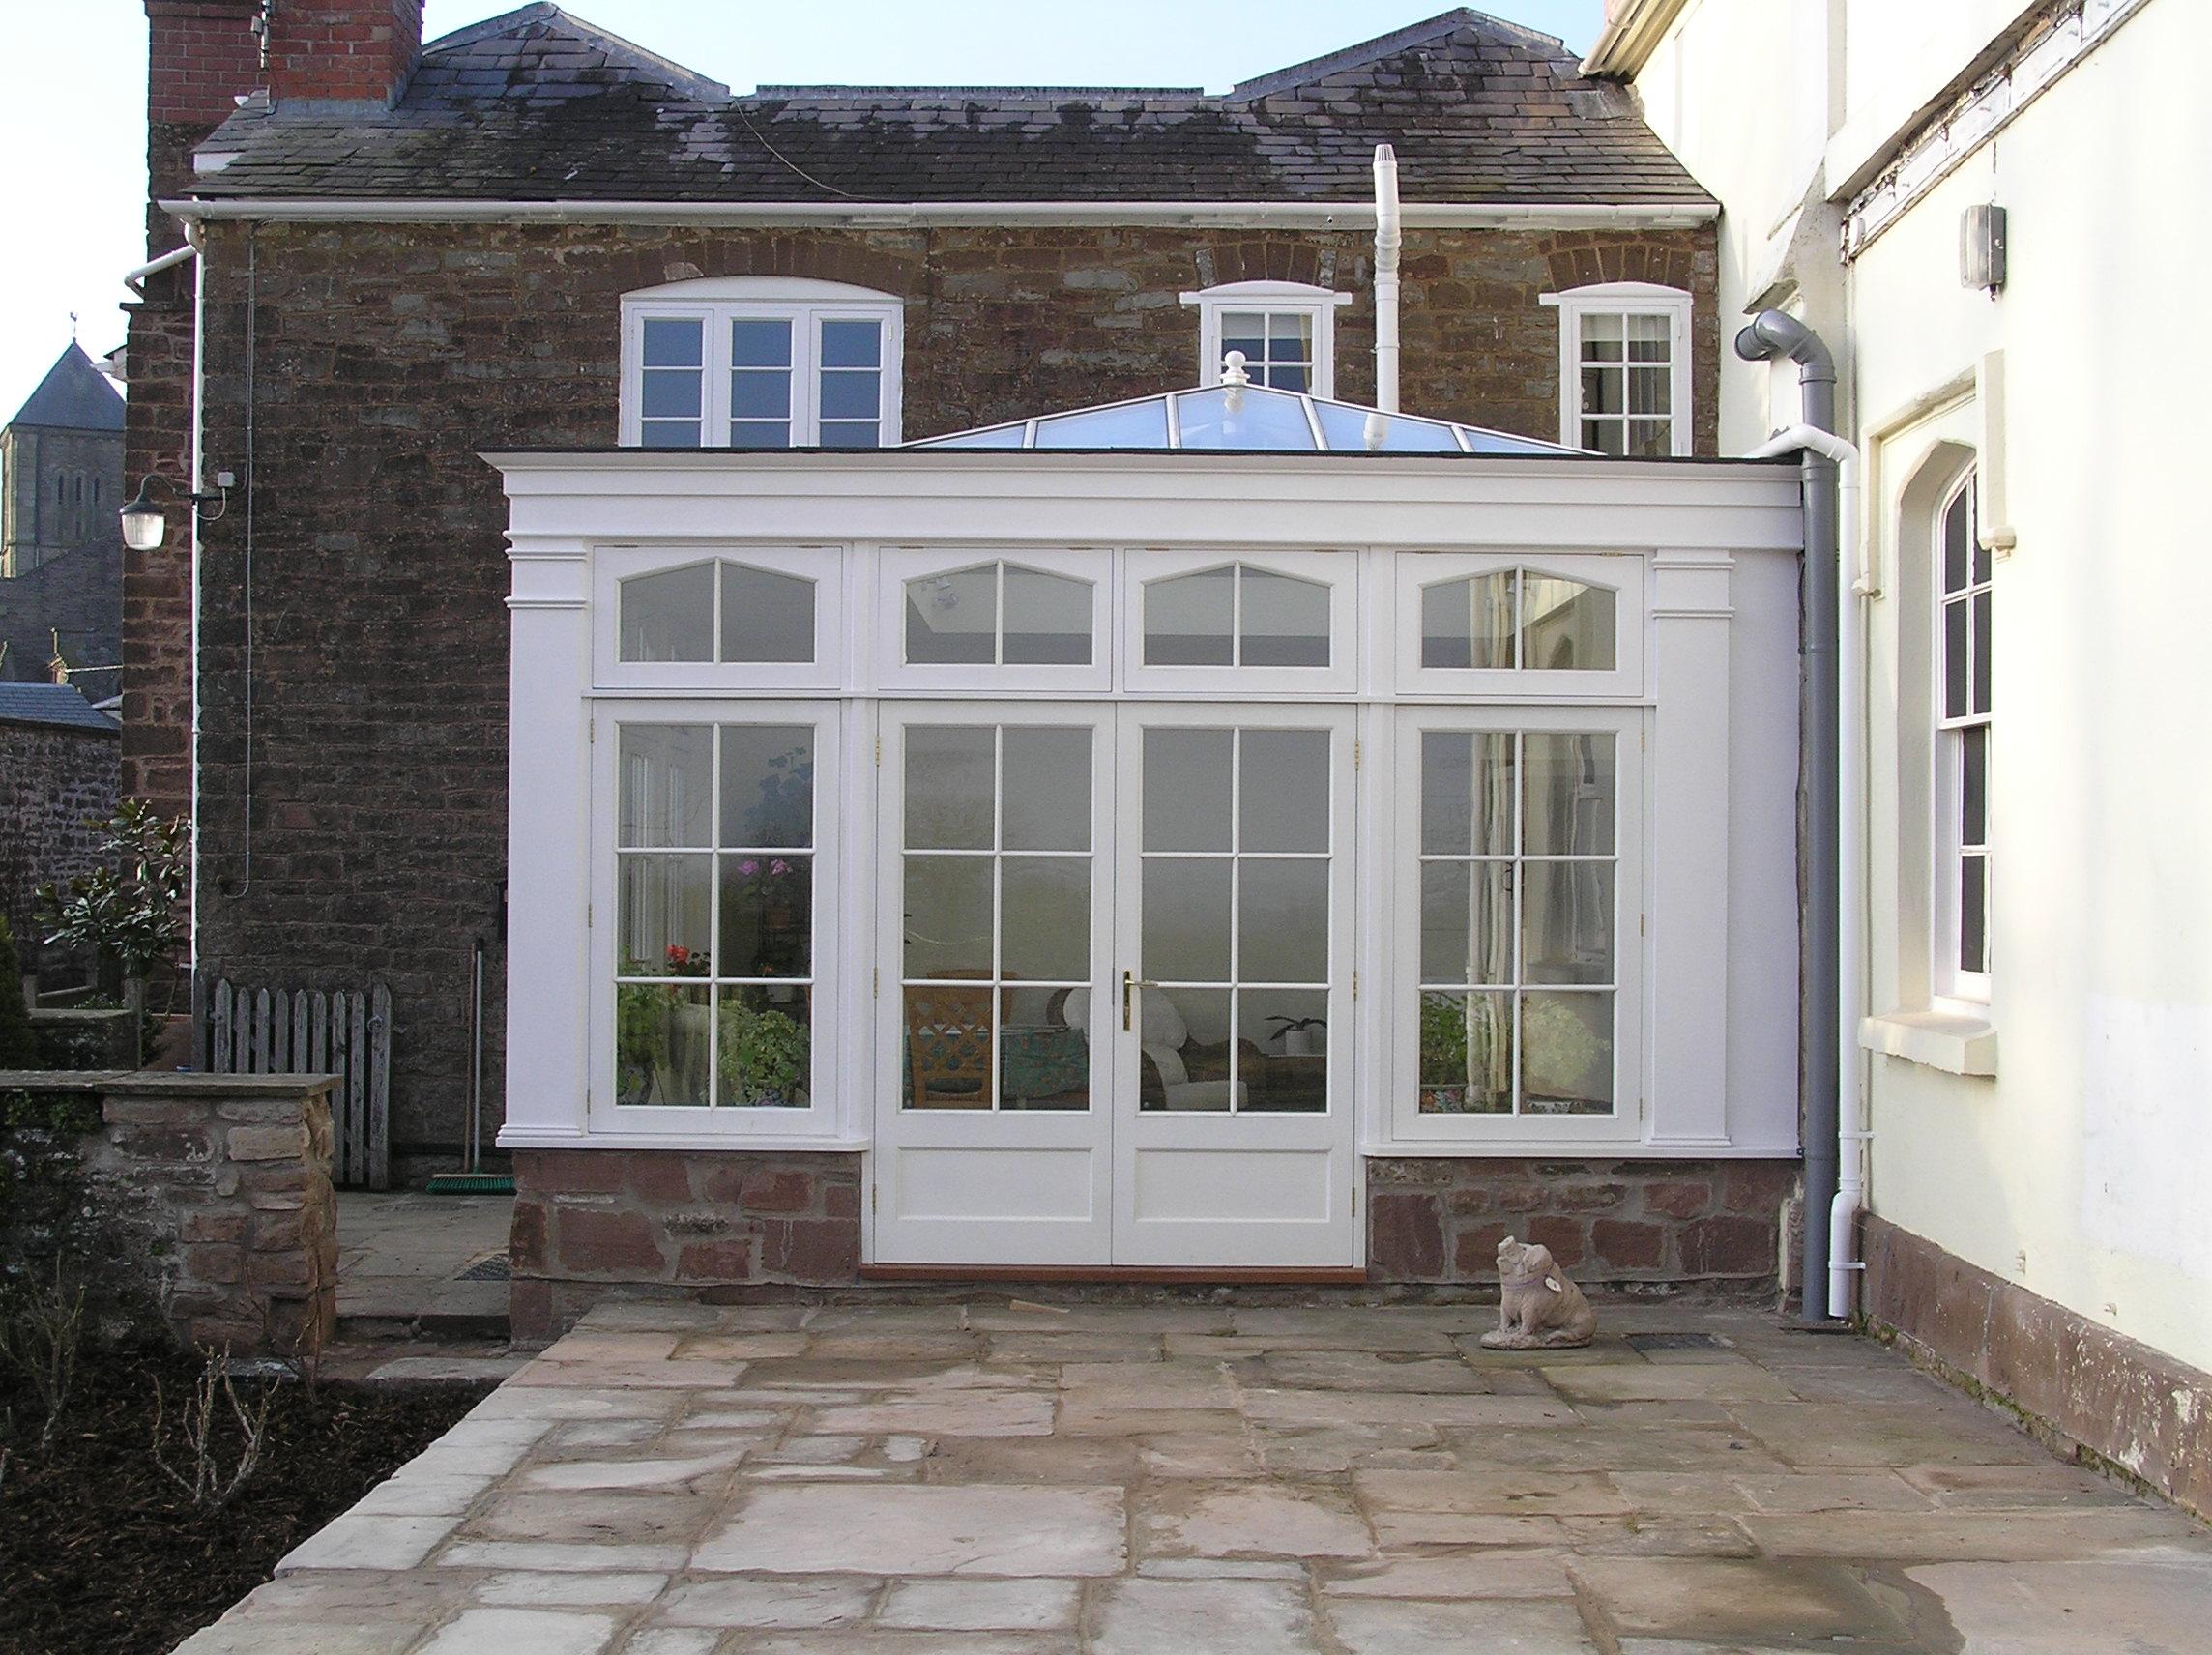 Handmade Bespoke  Joinery Hereford Carpentry Carpenters Hardwood Oak Windows Doors Kitchens Stairs